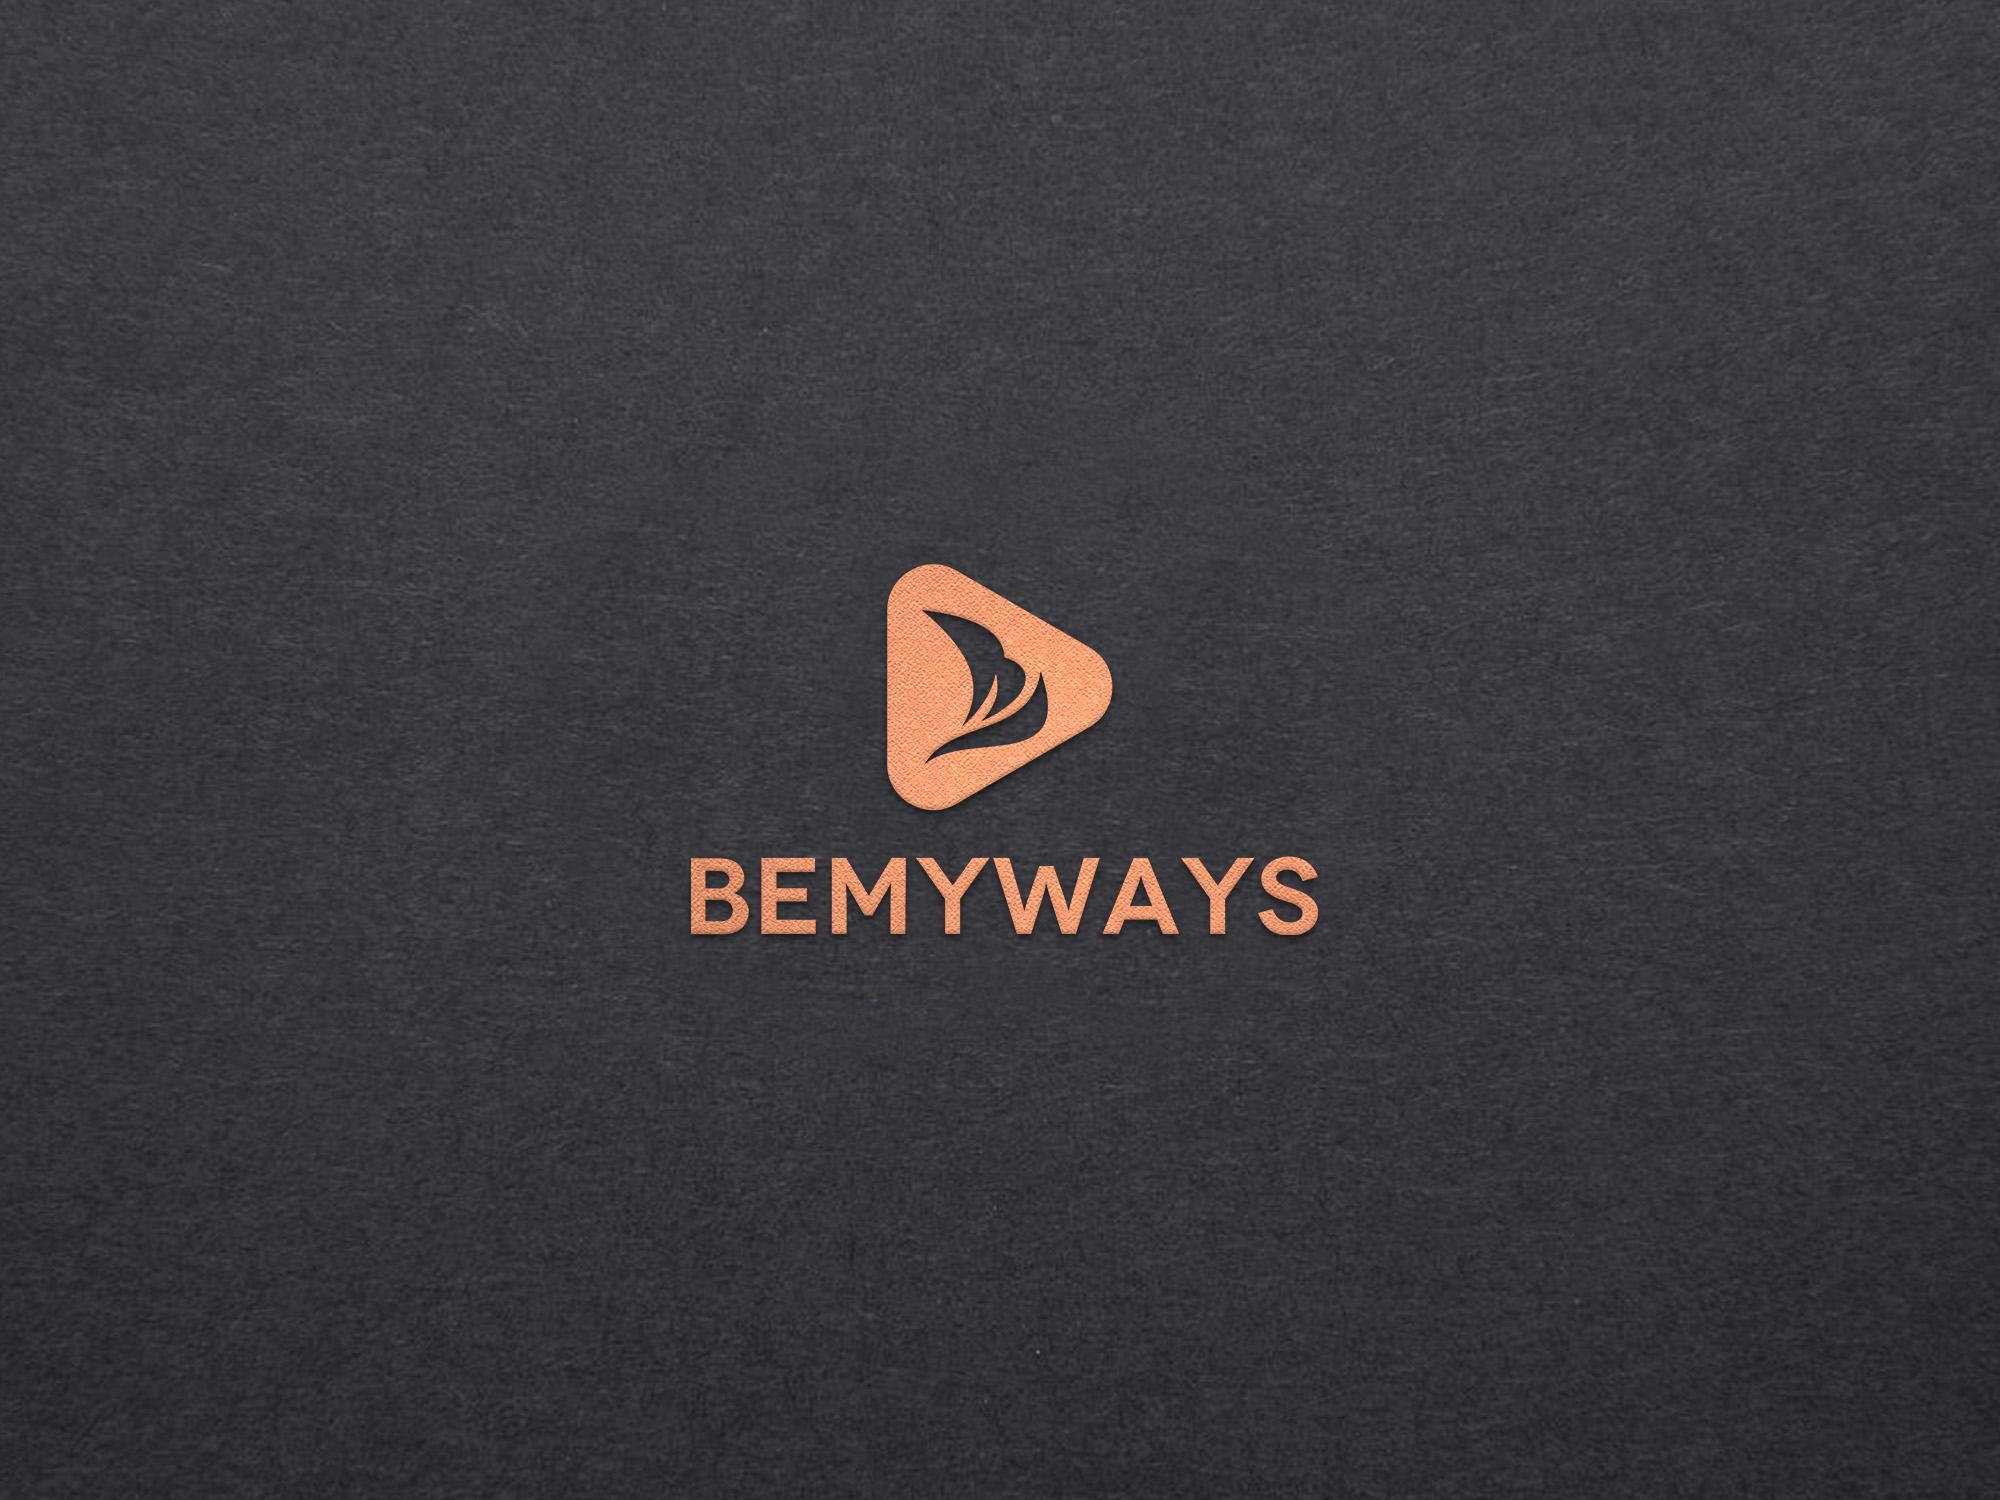 Разработка логотипа и иконки для Travel Video Platform фото f_1045c3c17bae5c87.jpg